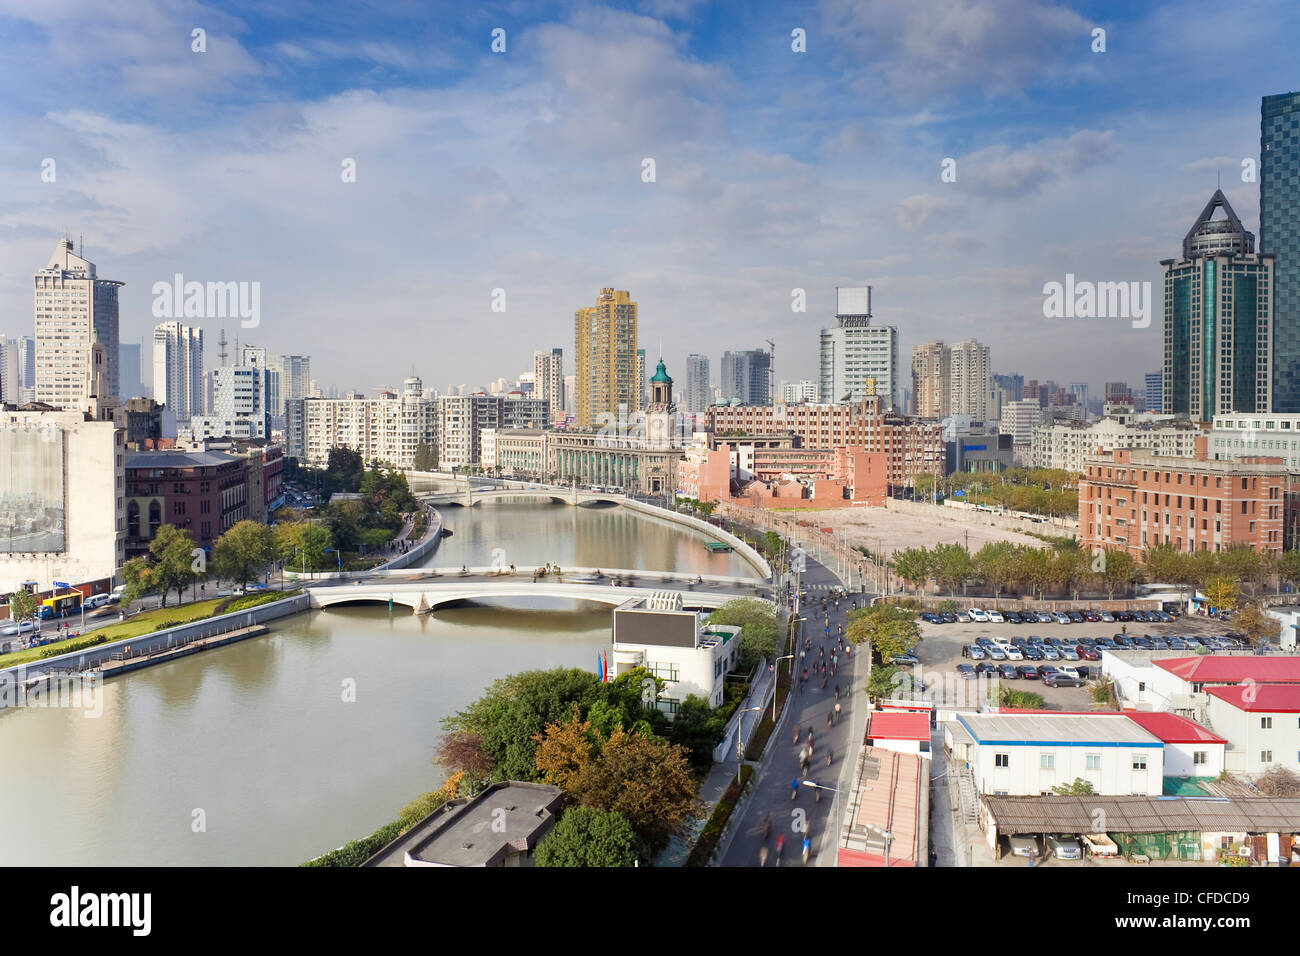 Elevated view along Suzhou Creek, new bridges and city skyline, Shanghai, China, Asia - Stock Image